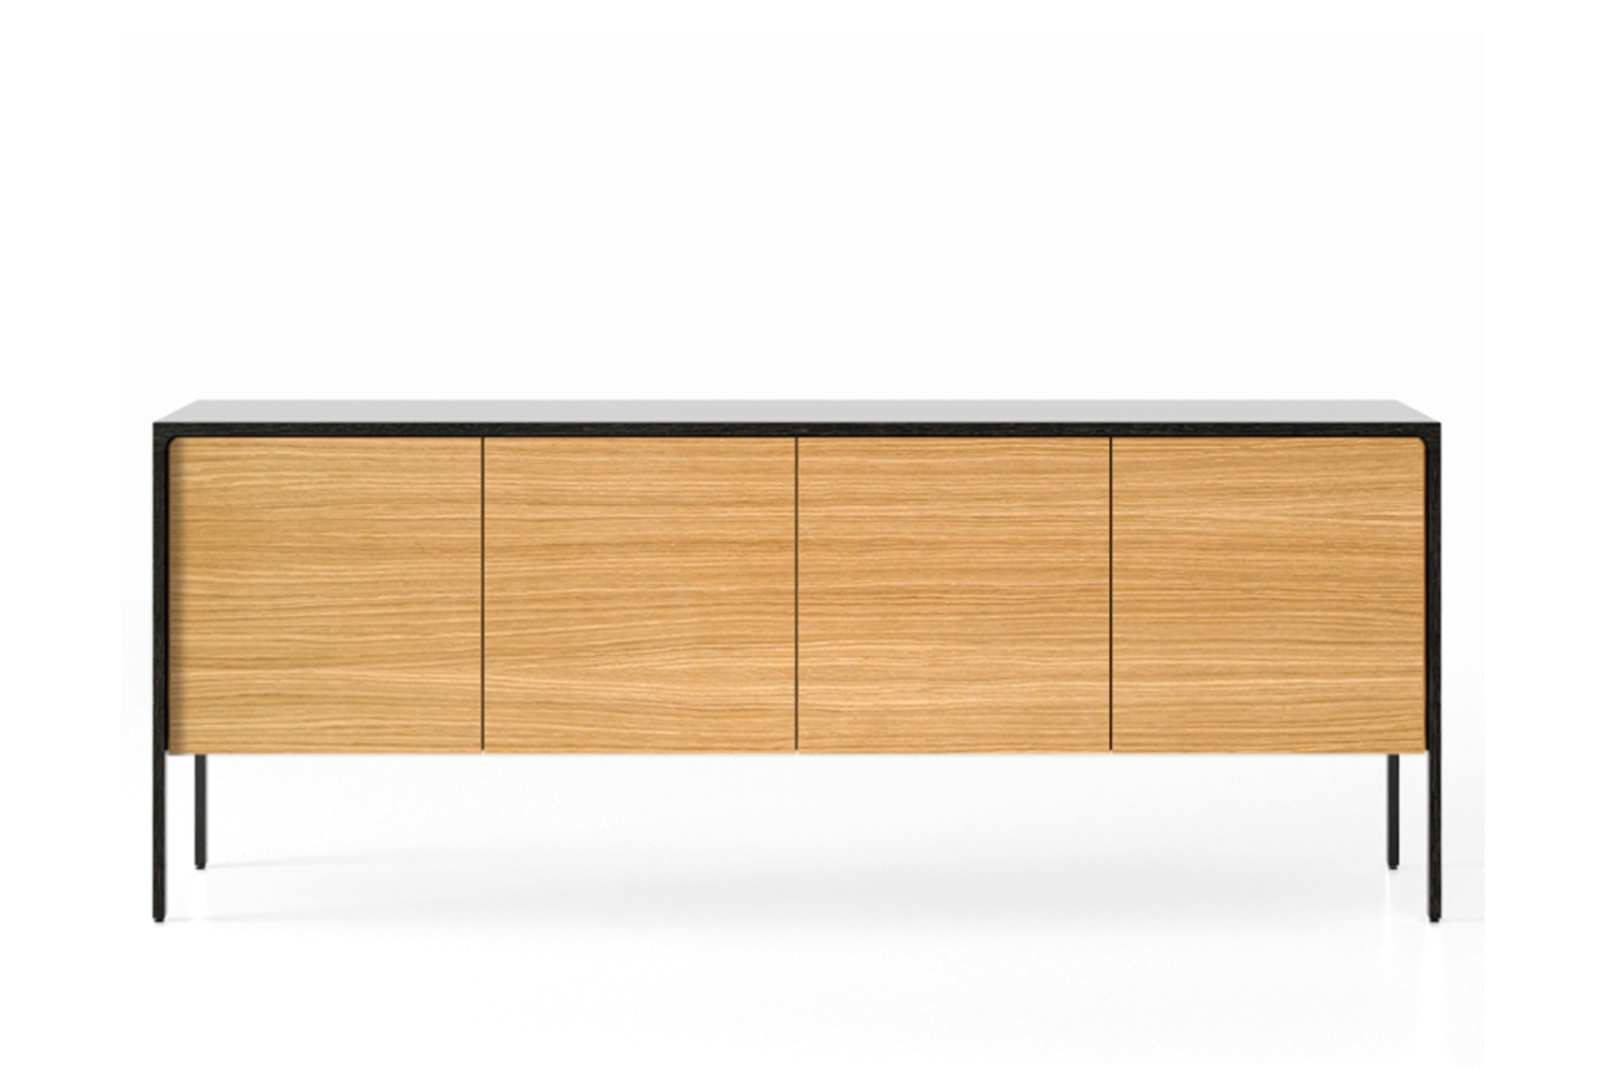 TAC215 Tactile Sideboard Super-Matt Oak, Cream Texturised Lacquered (ncs1005-u50r)